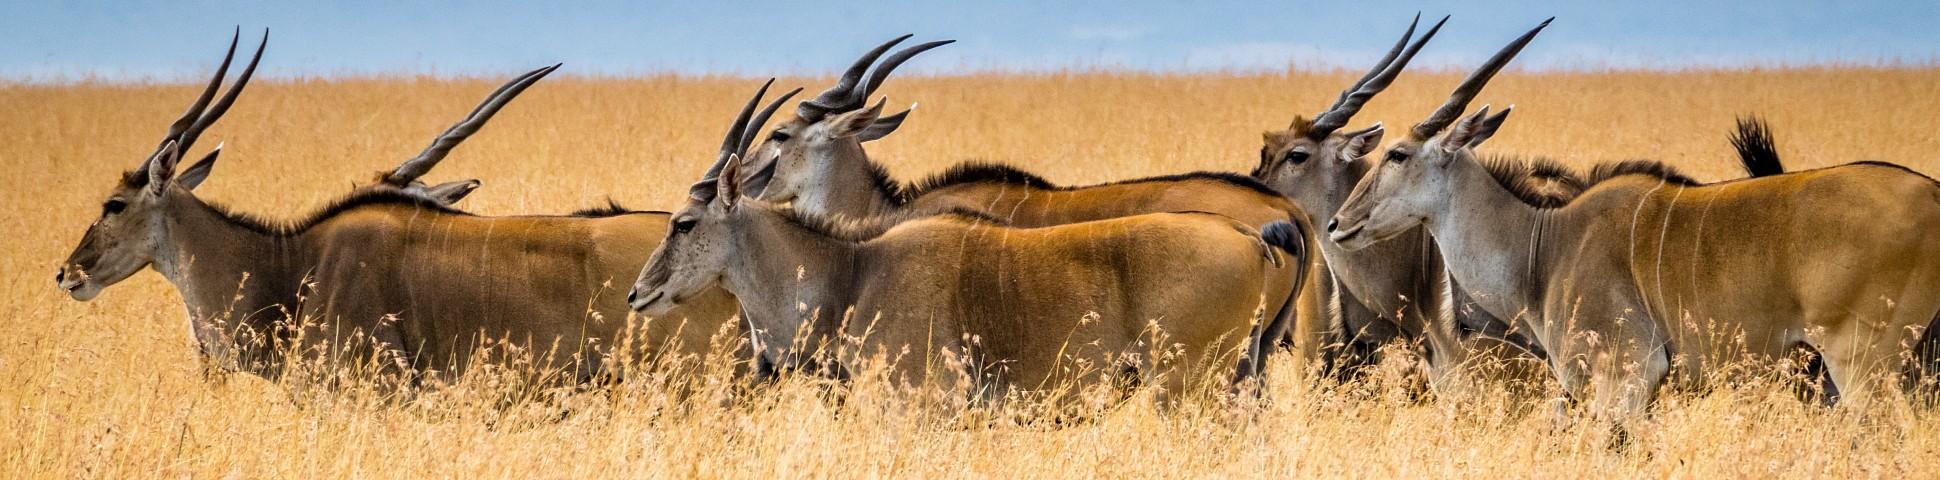 Group of antelopes in Masai Mara